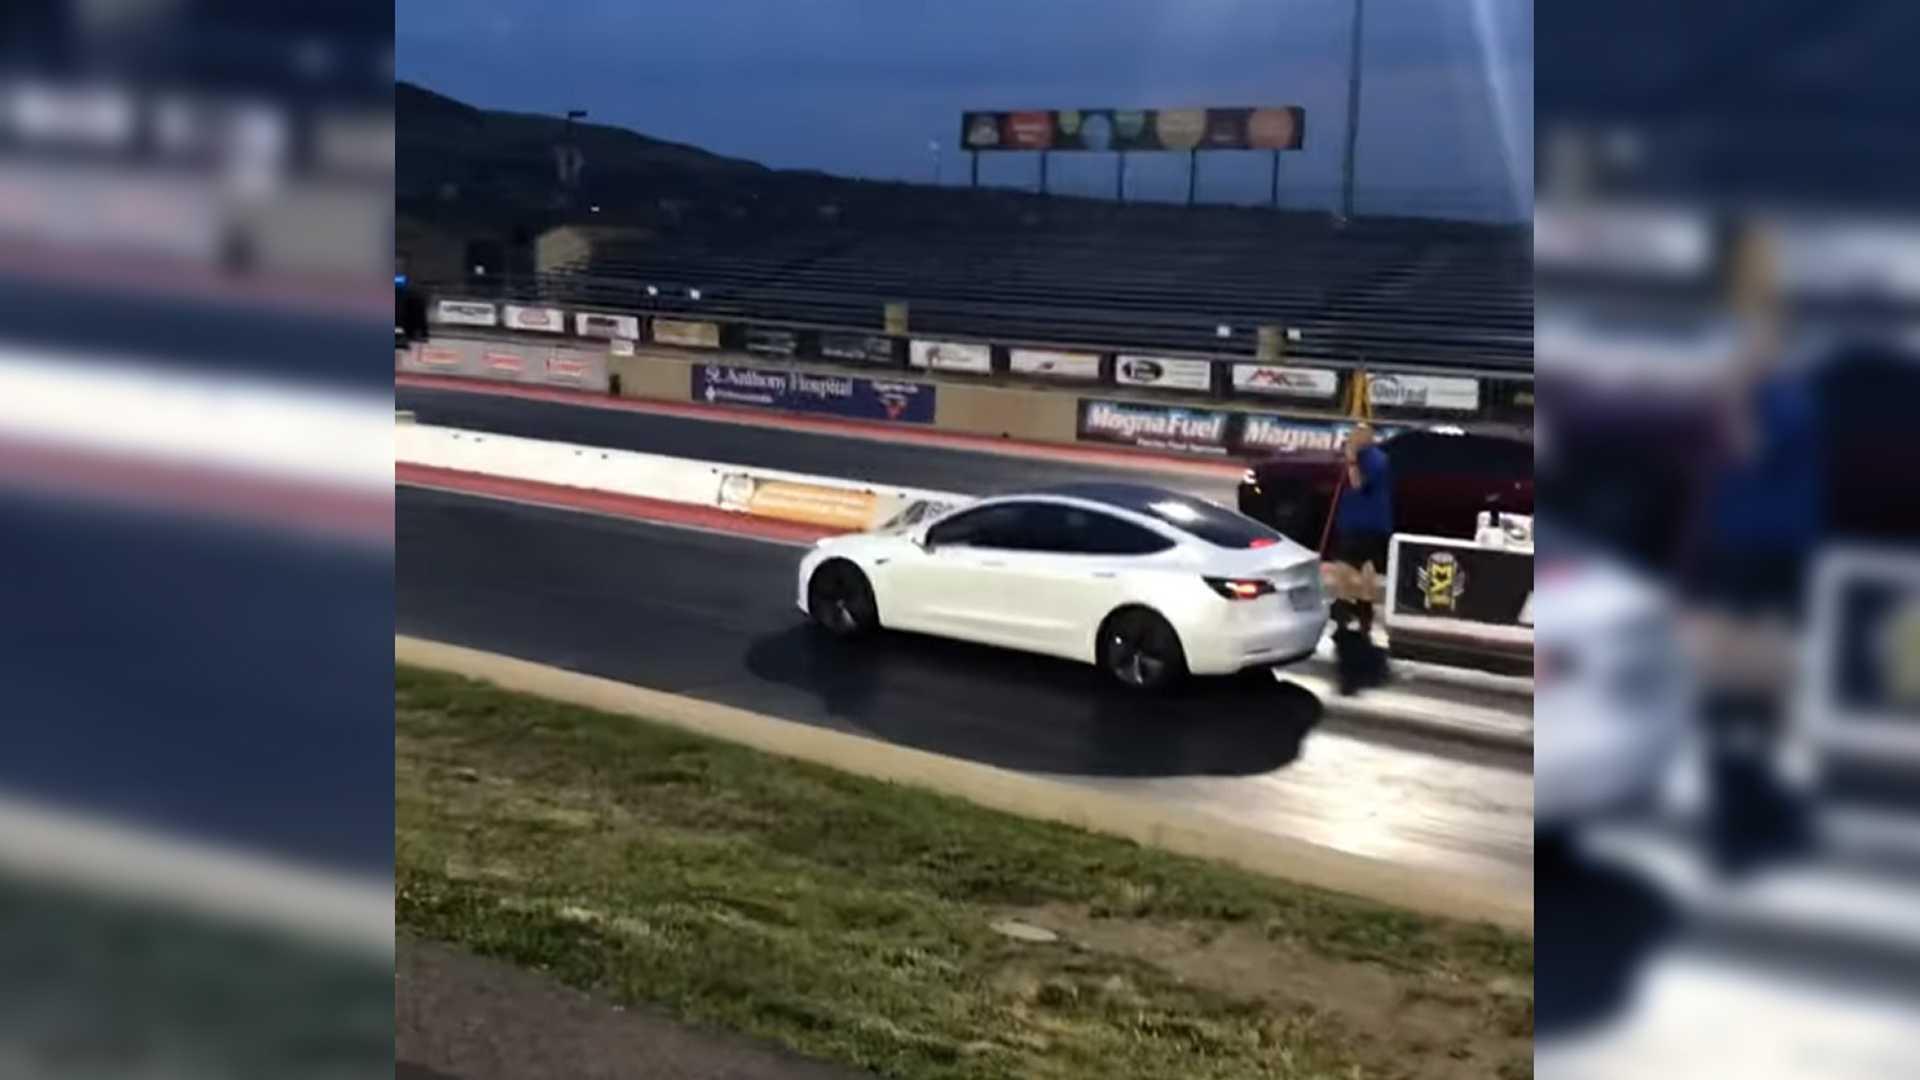 Tesla Model 3 Performance Trounces Challenger Hellcat In Drag Race